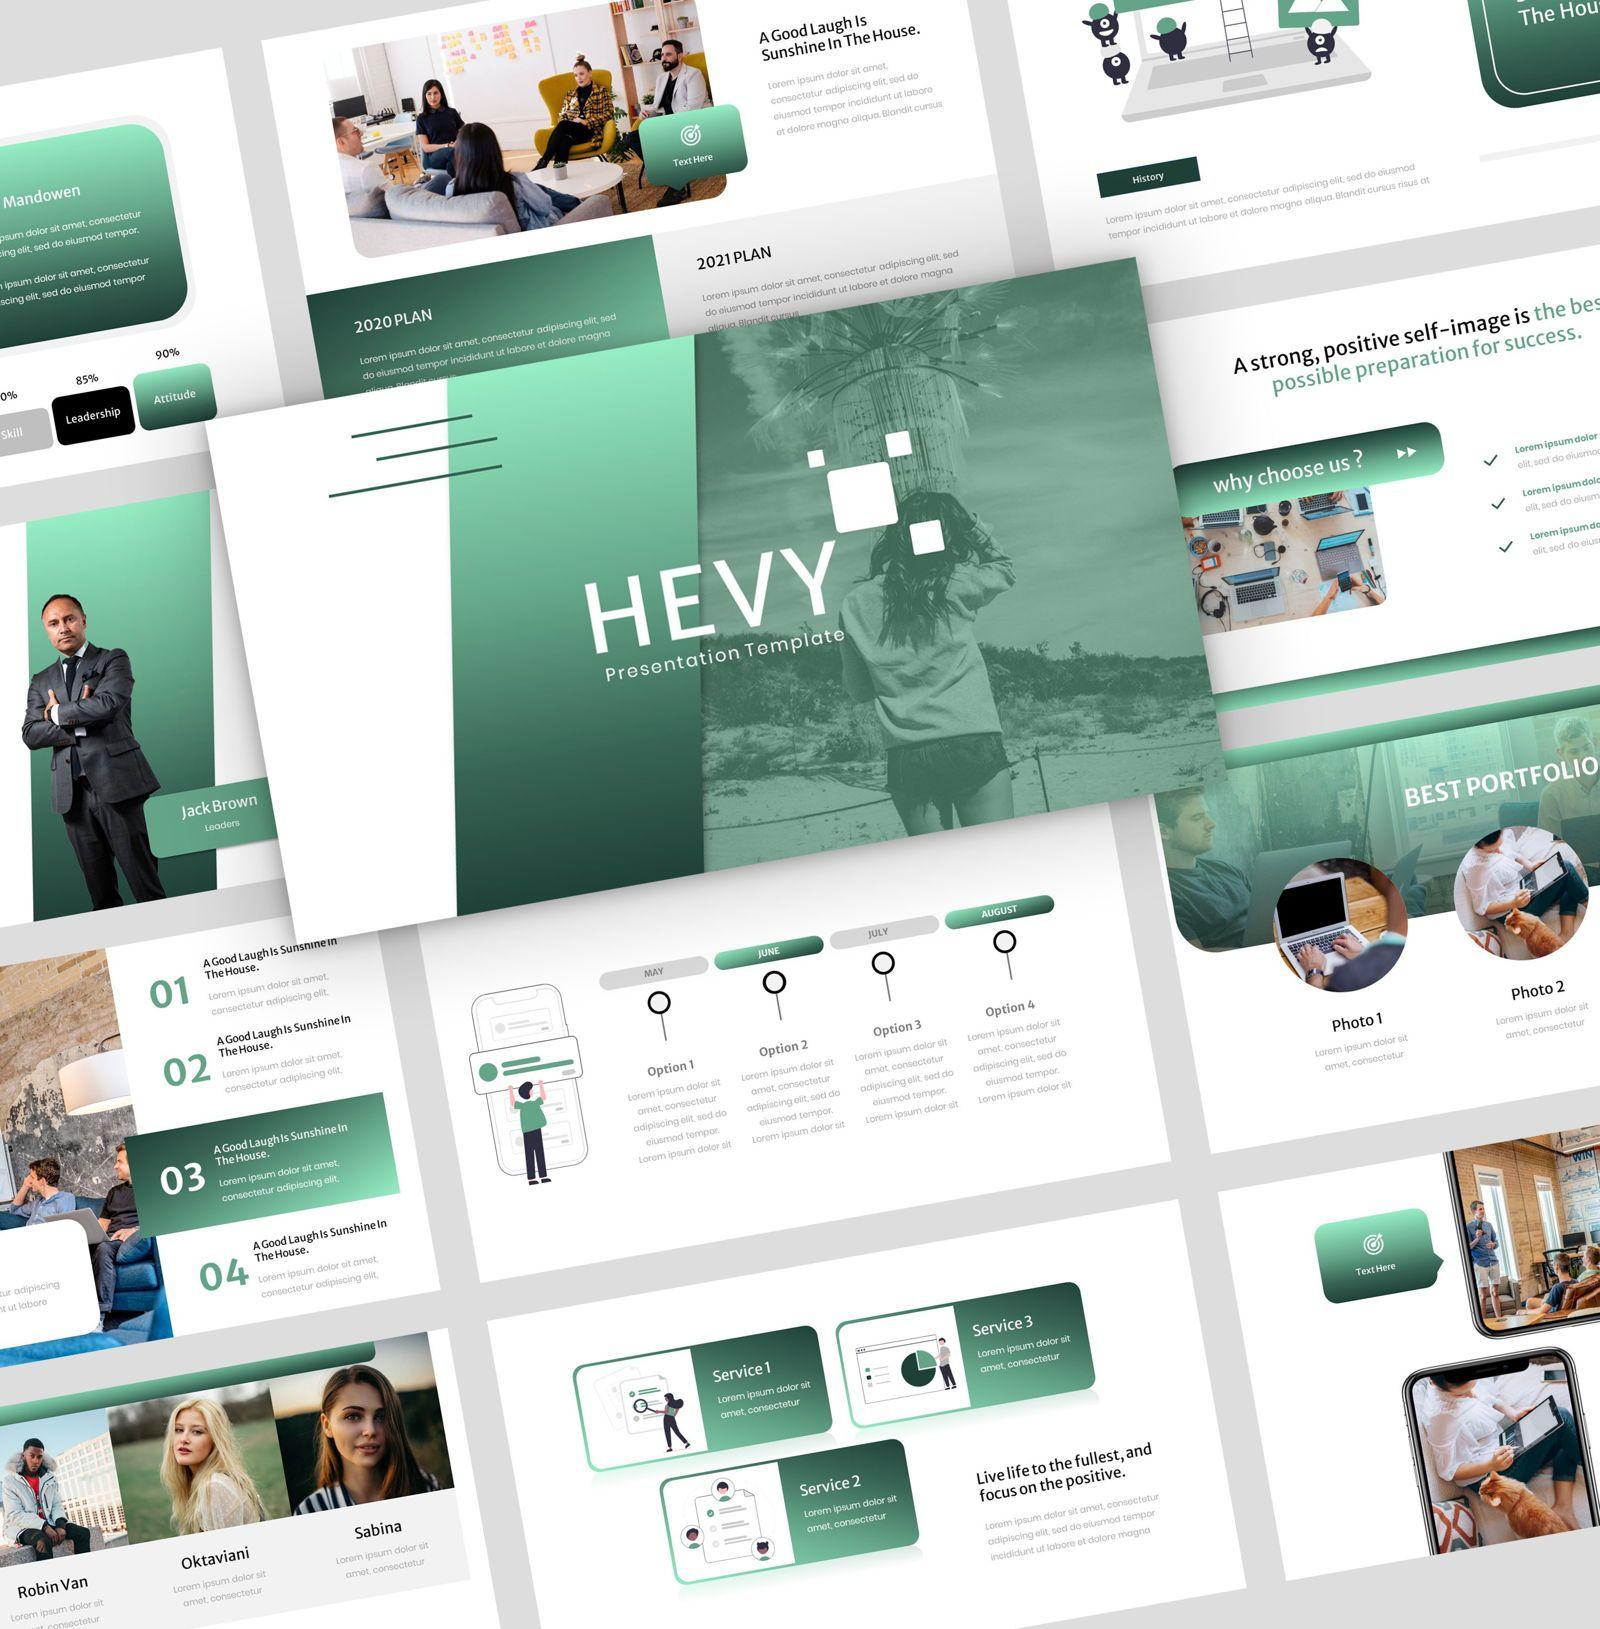 Hevy - Google Slide Presentation Template, 08147, Presentation Templates — PoweredTemplate.com